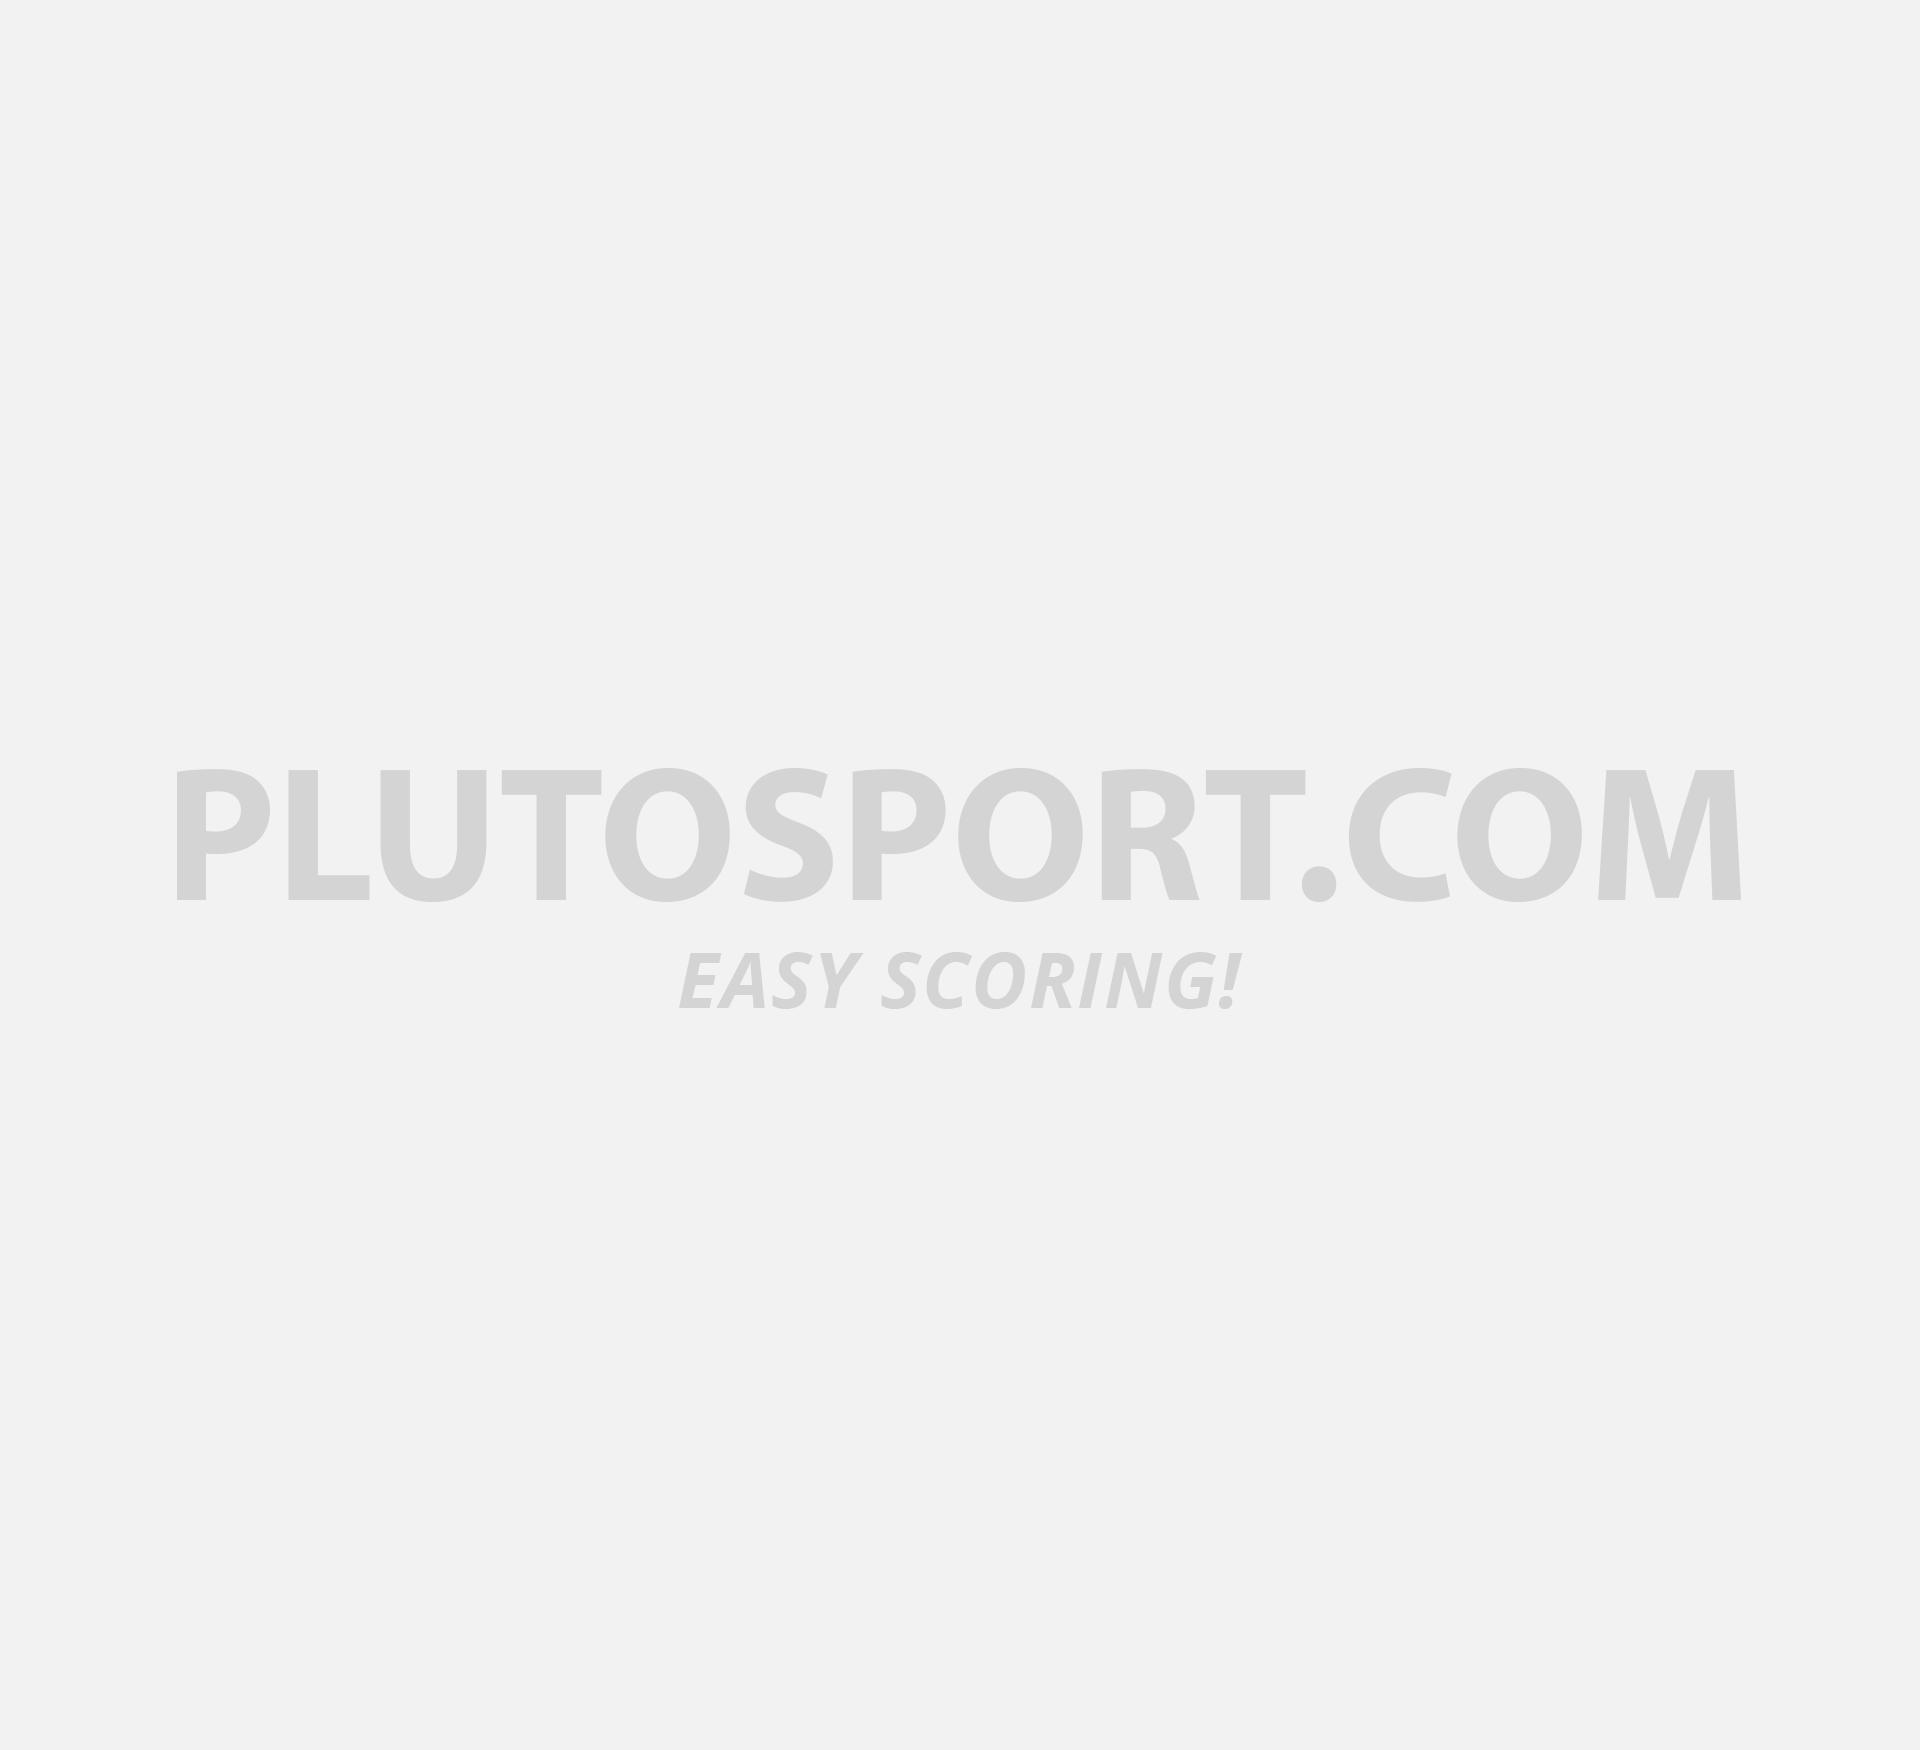 Asics Gel-Blackheath 4 Hockeyshoes Men